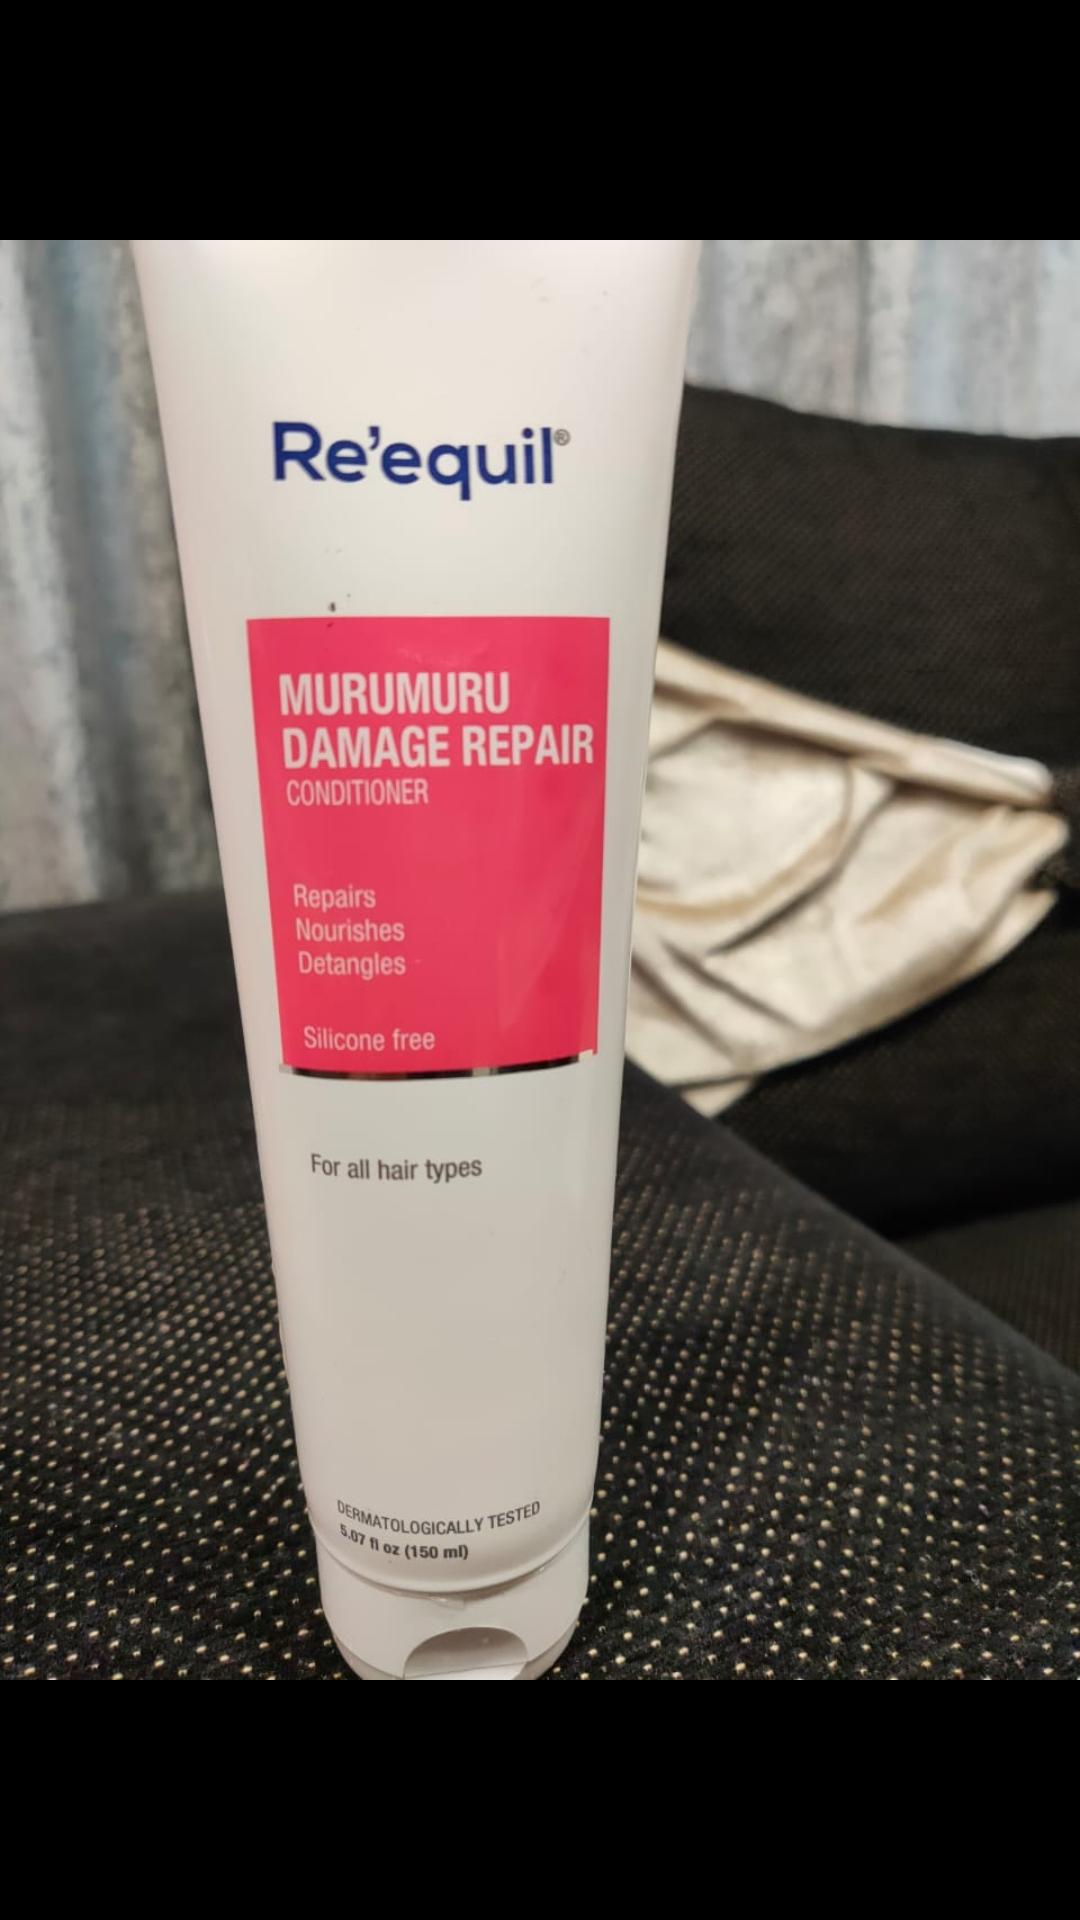 Re'equil Murumuru Damage Repair Conditioner -Amazing conditioner-By mukta_phutela